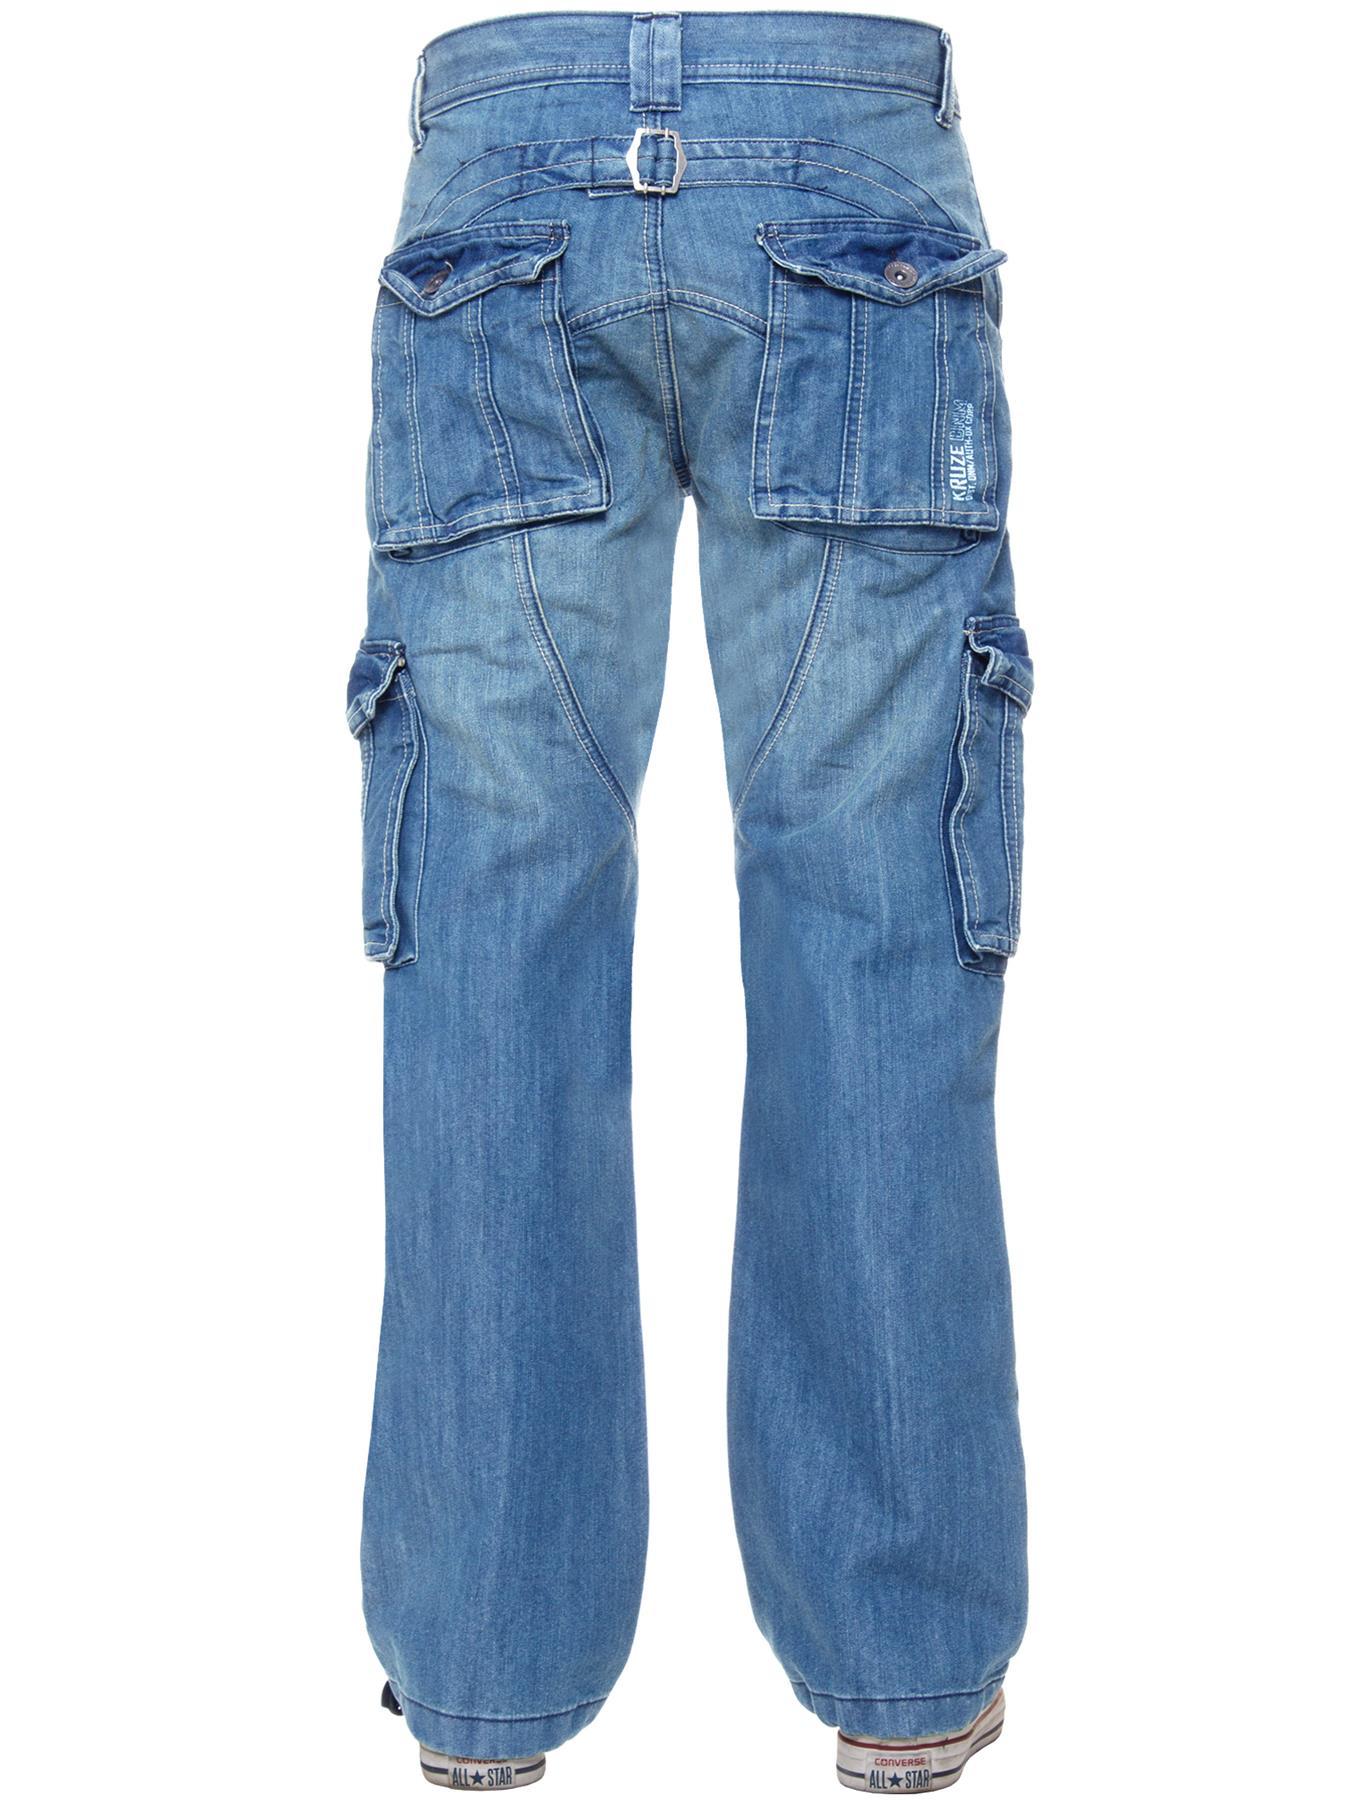 Kruze-Mens-Desginer-Cargo-Combat-Jeans-Trousers-Denim-Pants-Big-Tall-All-Waists thumbnail 16